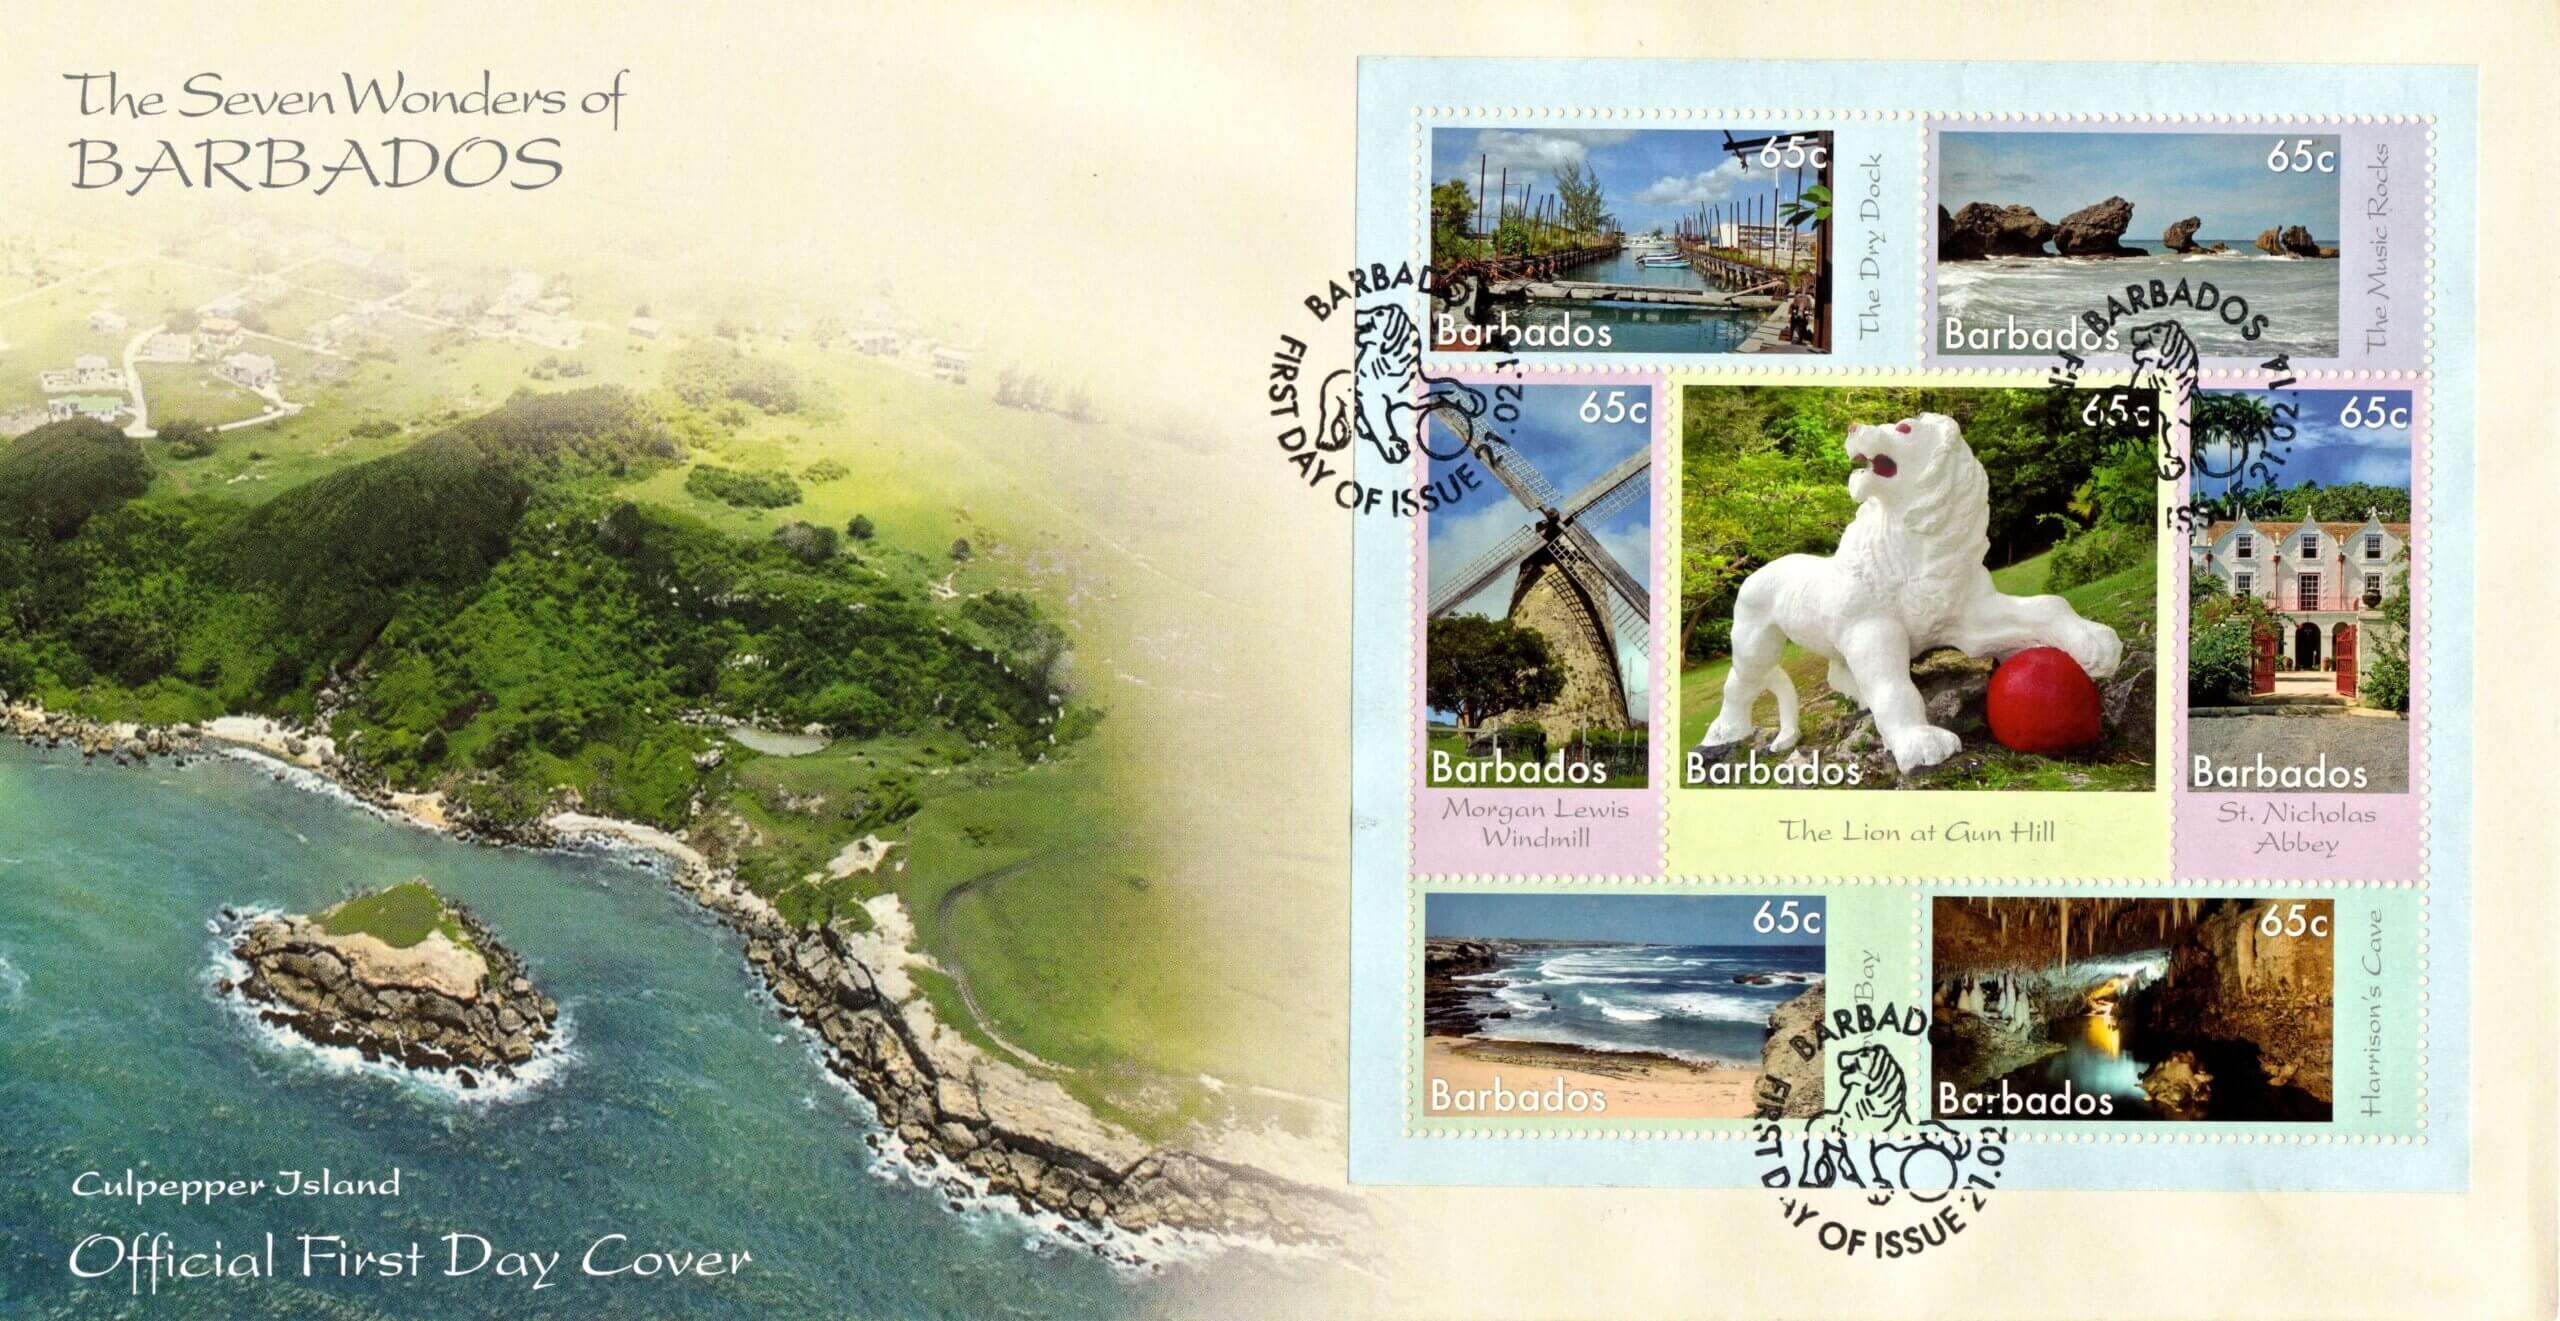 7 Wonders of Barbados Mini Sheet FDC